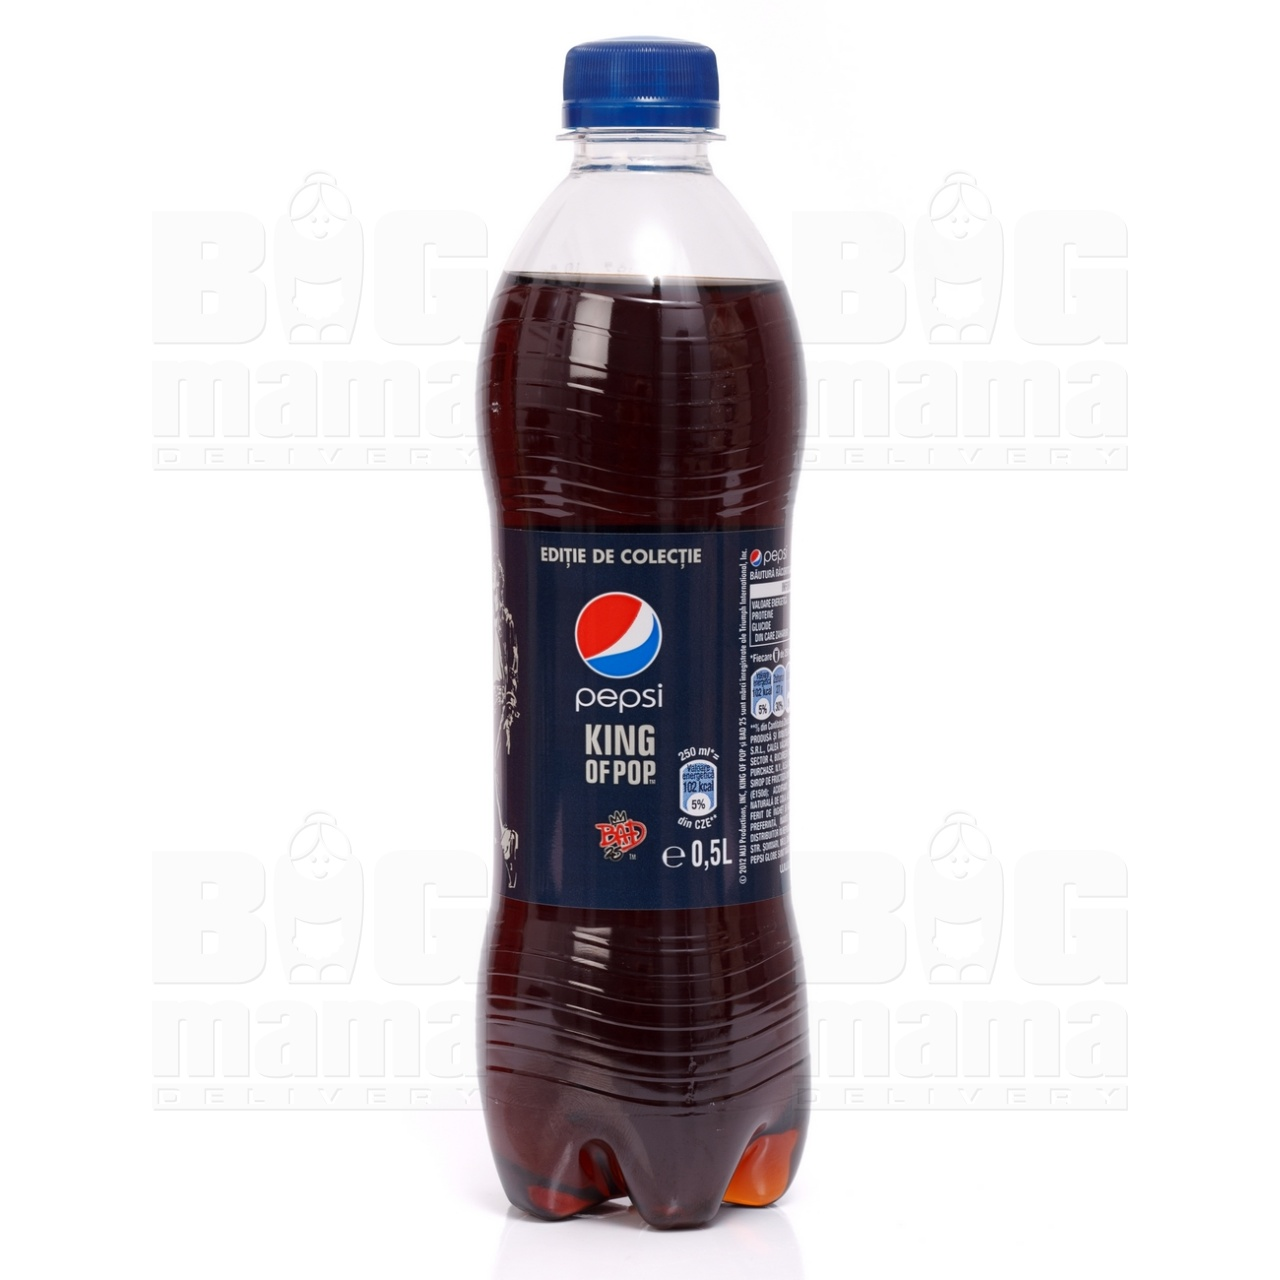 Product #87 image - Pepsi 0,5L